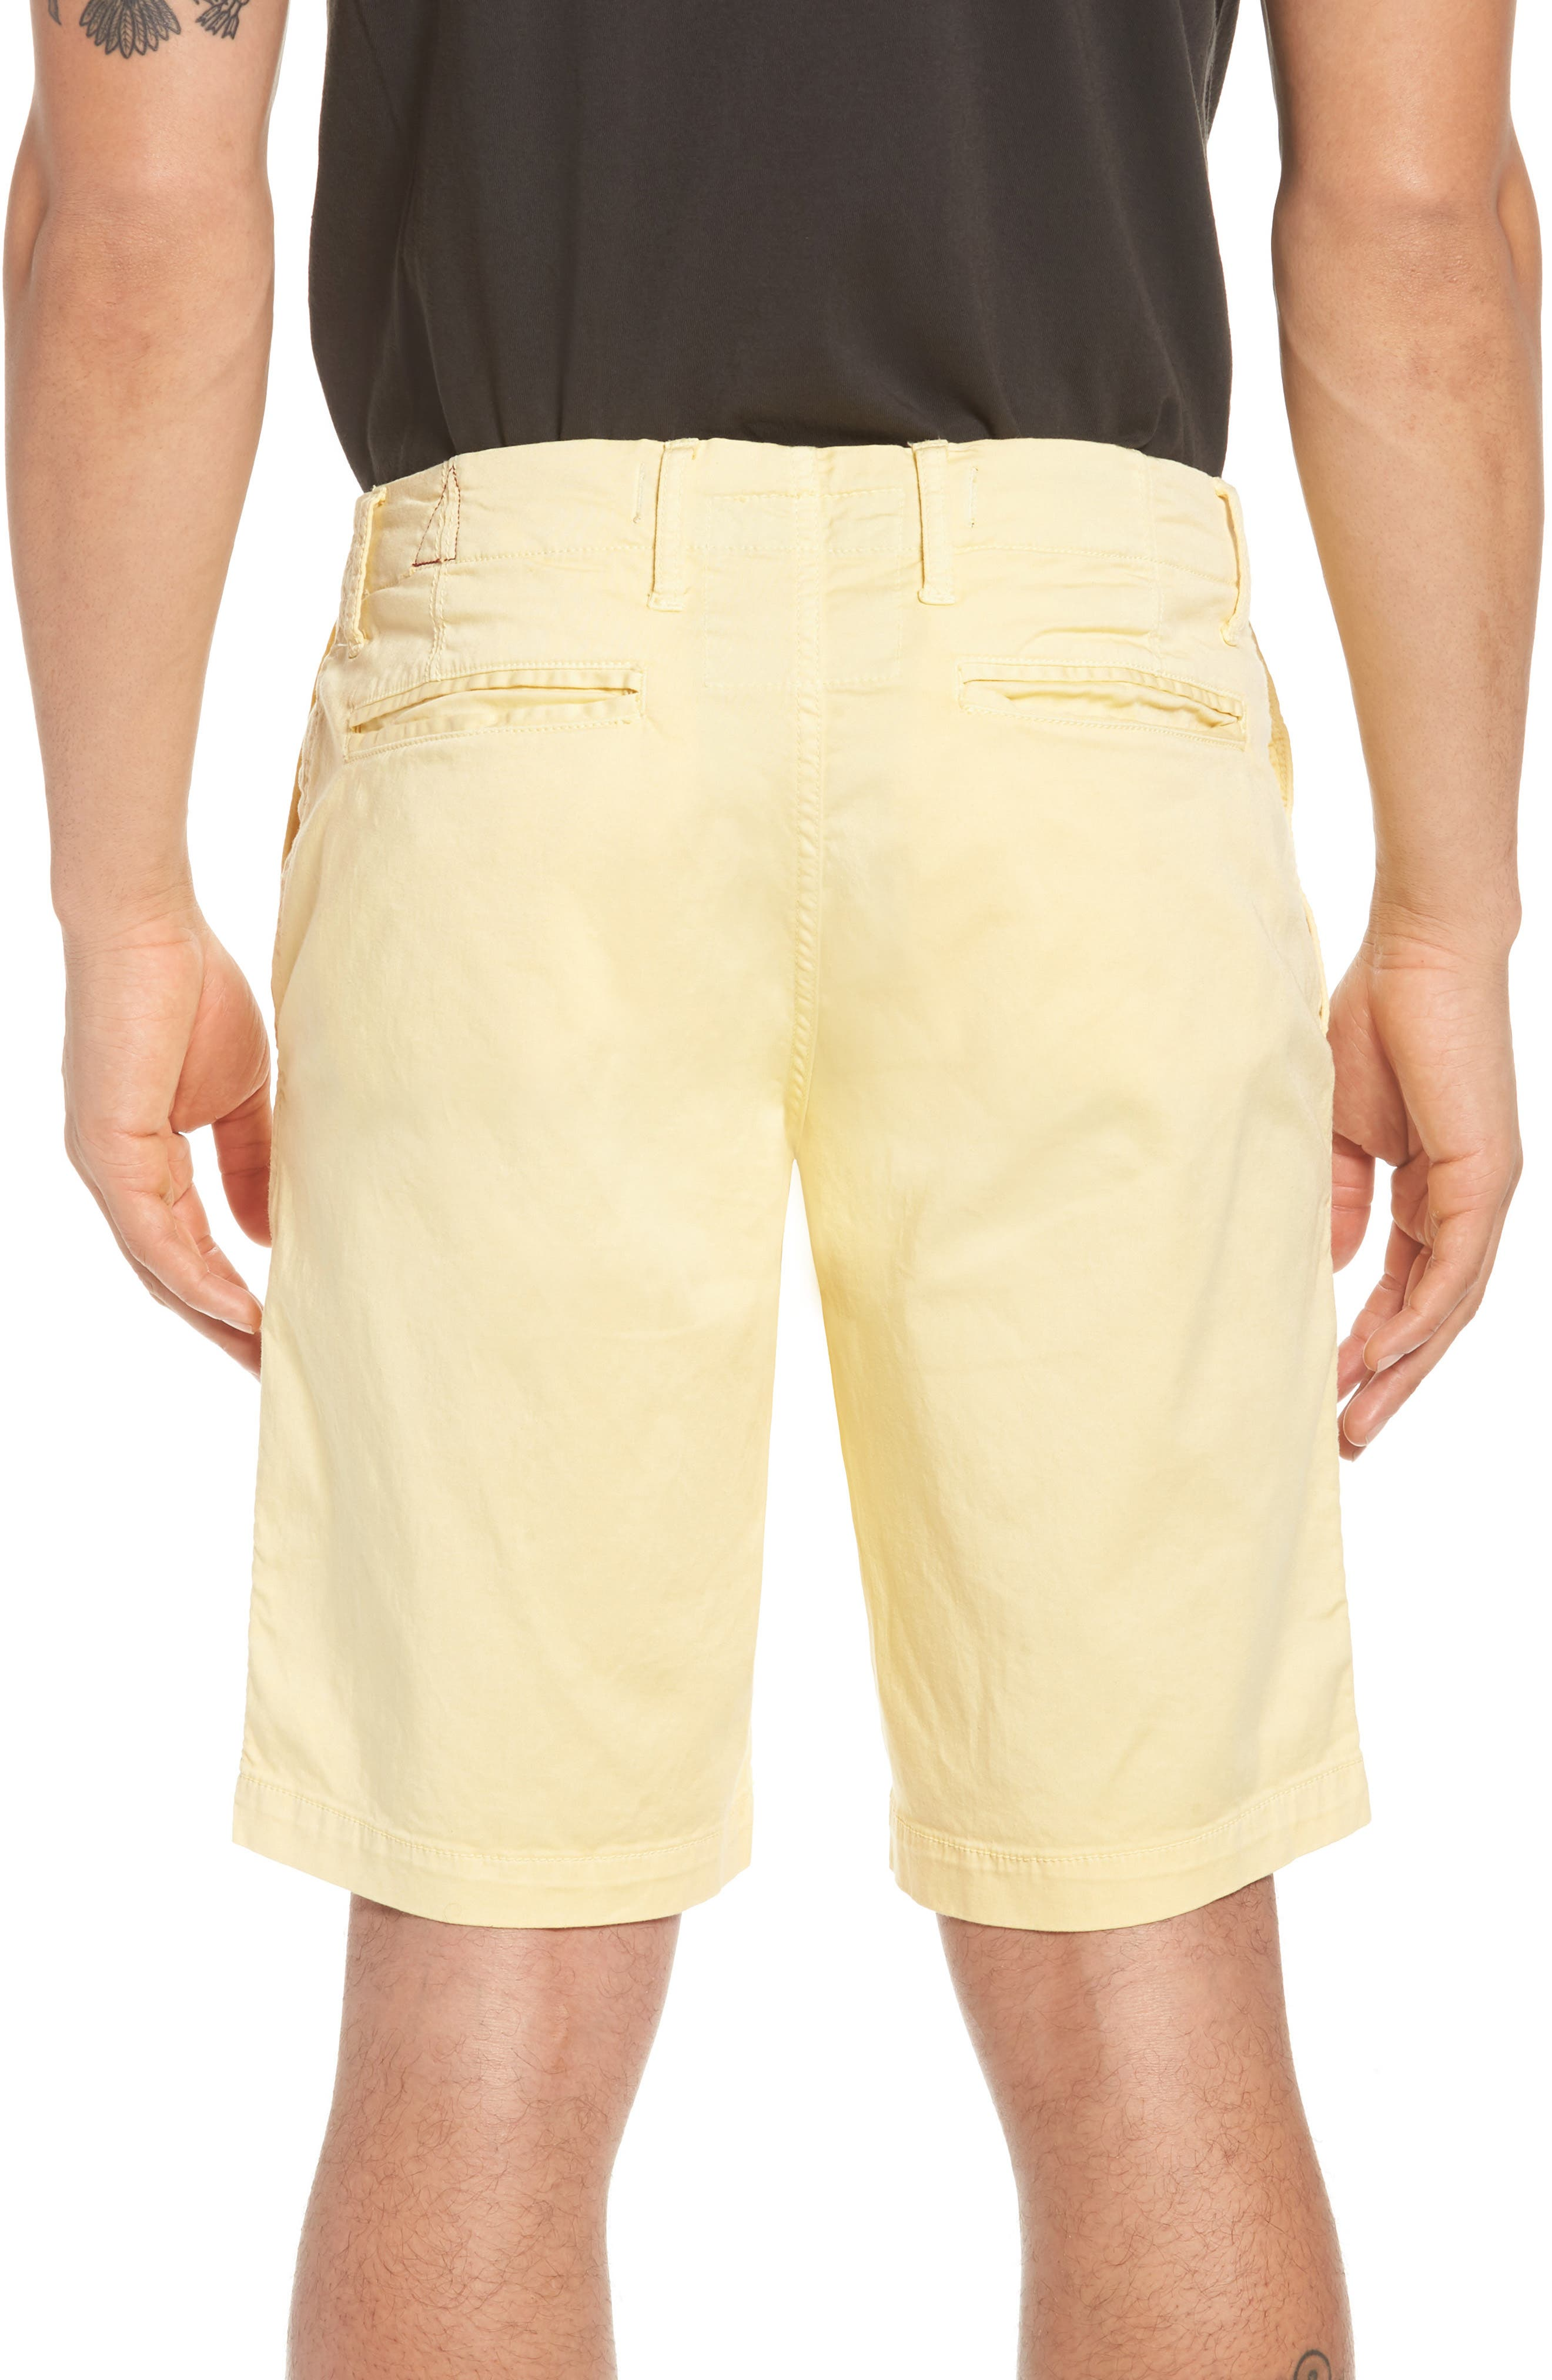 St. Barts Twill Shorts,                             Alternate thumbnail 24, color,